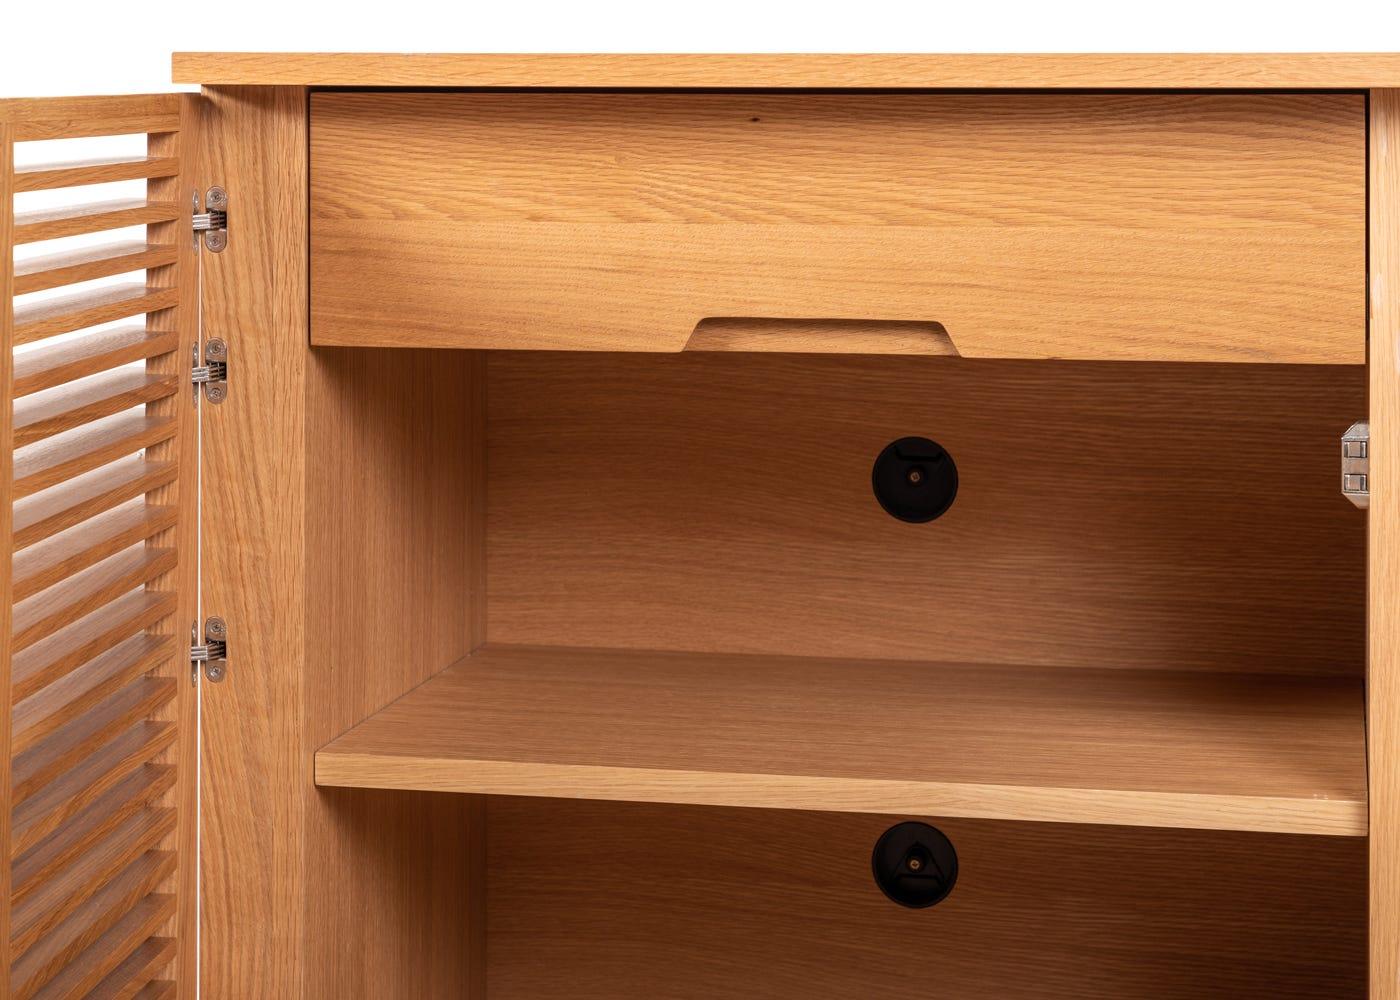 As shown: Verona small sideboard in oak - interior.